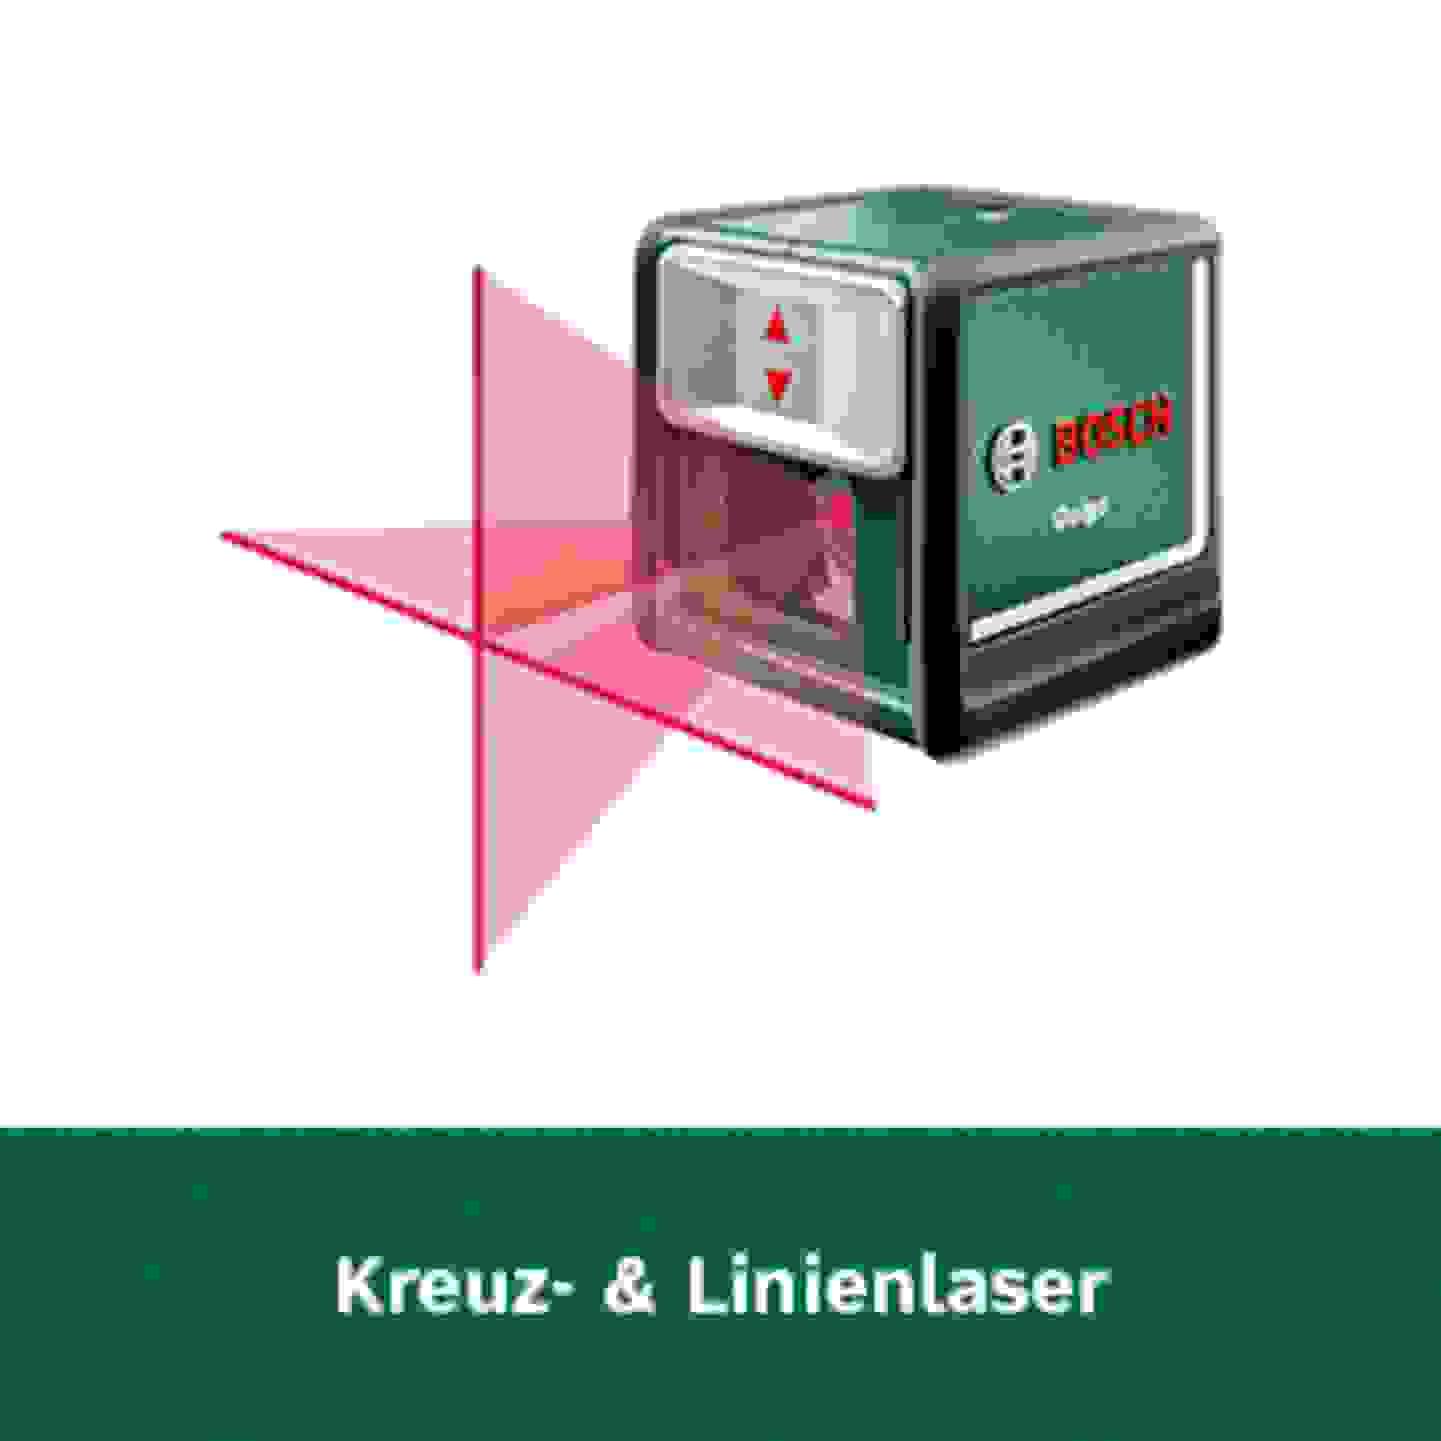 Kreuz- & Linienlaser